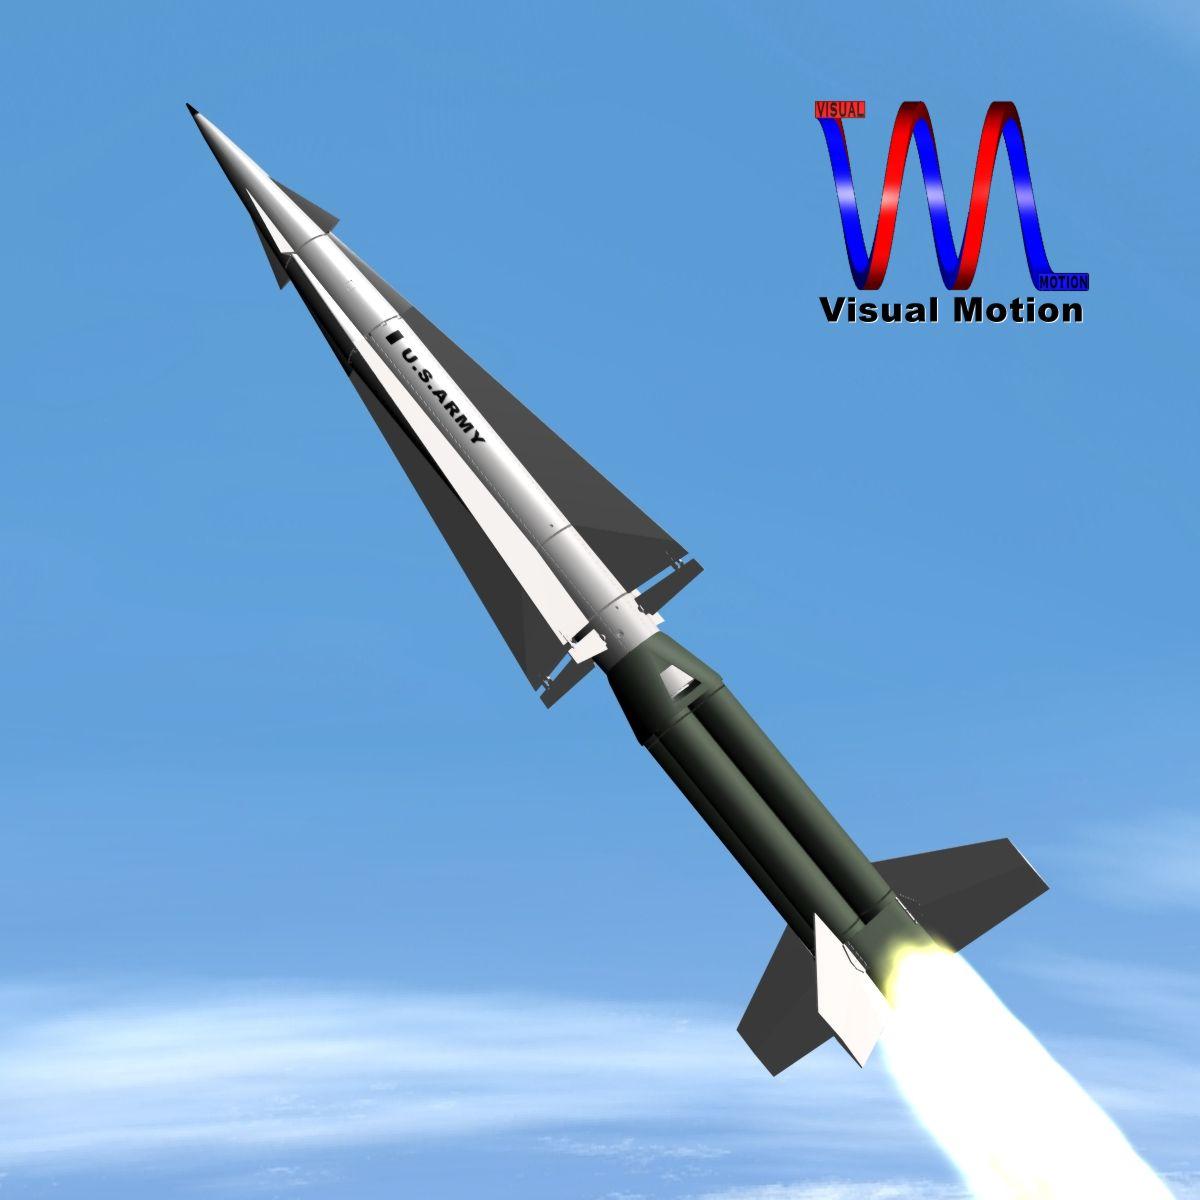 us nike hercules raketa 3d model 3ds dxf cob x obj 150340